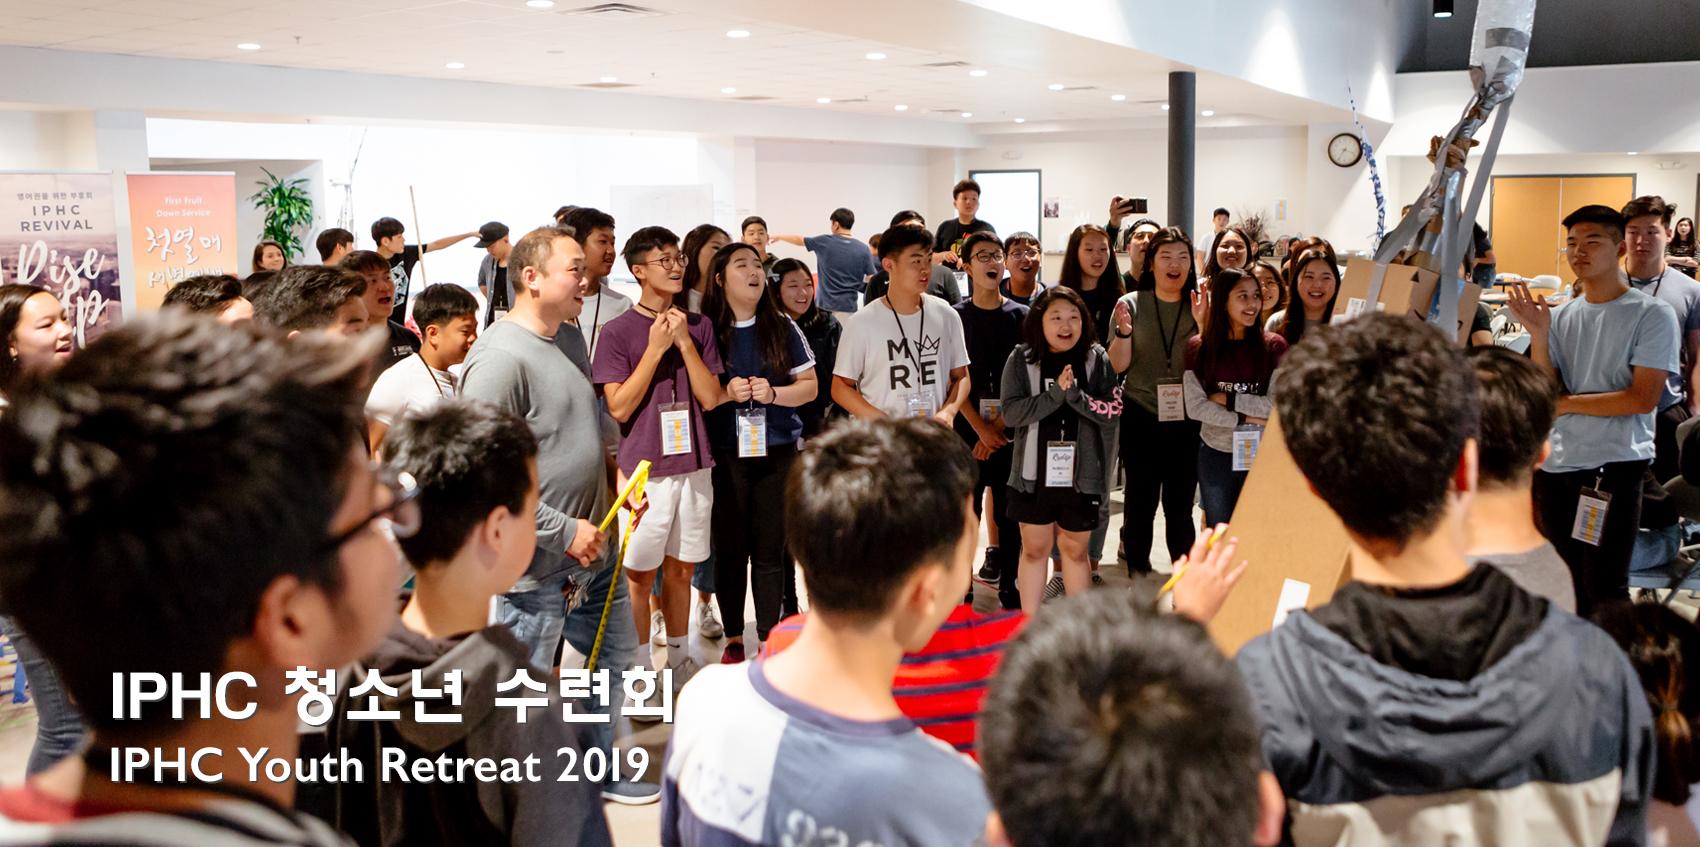 IPHC Youth Retreat 2019(4)